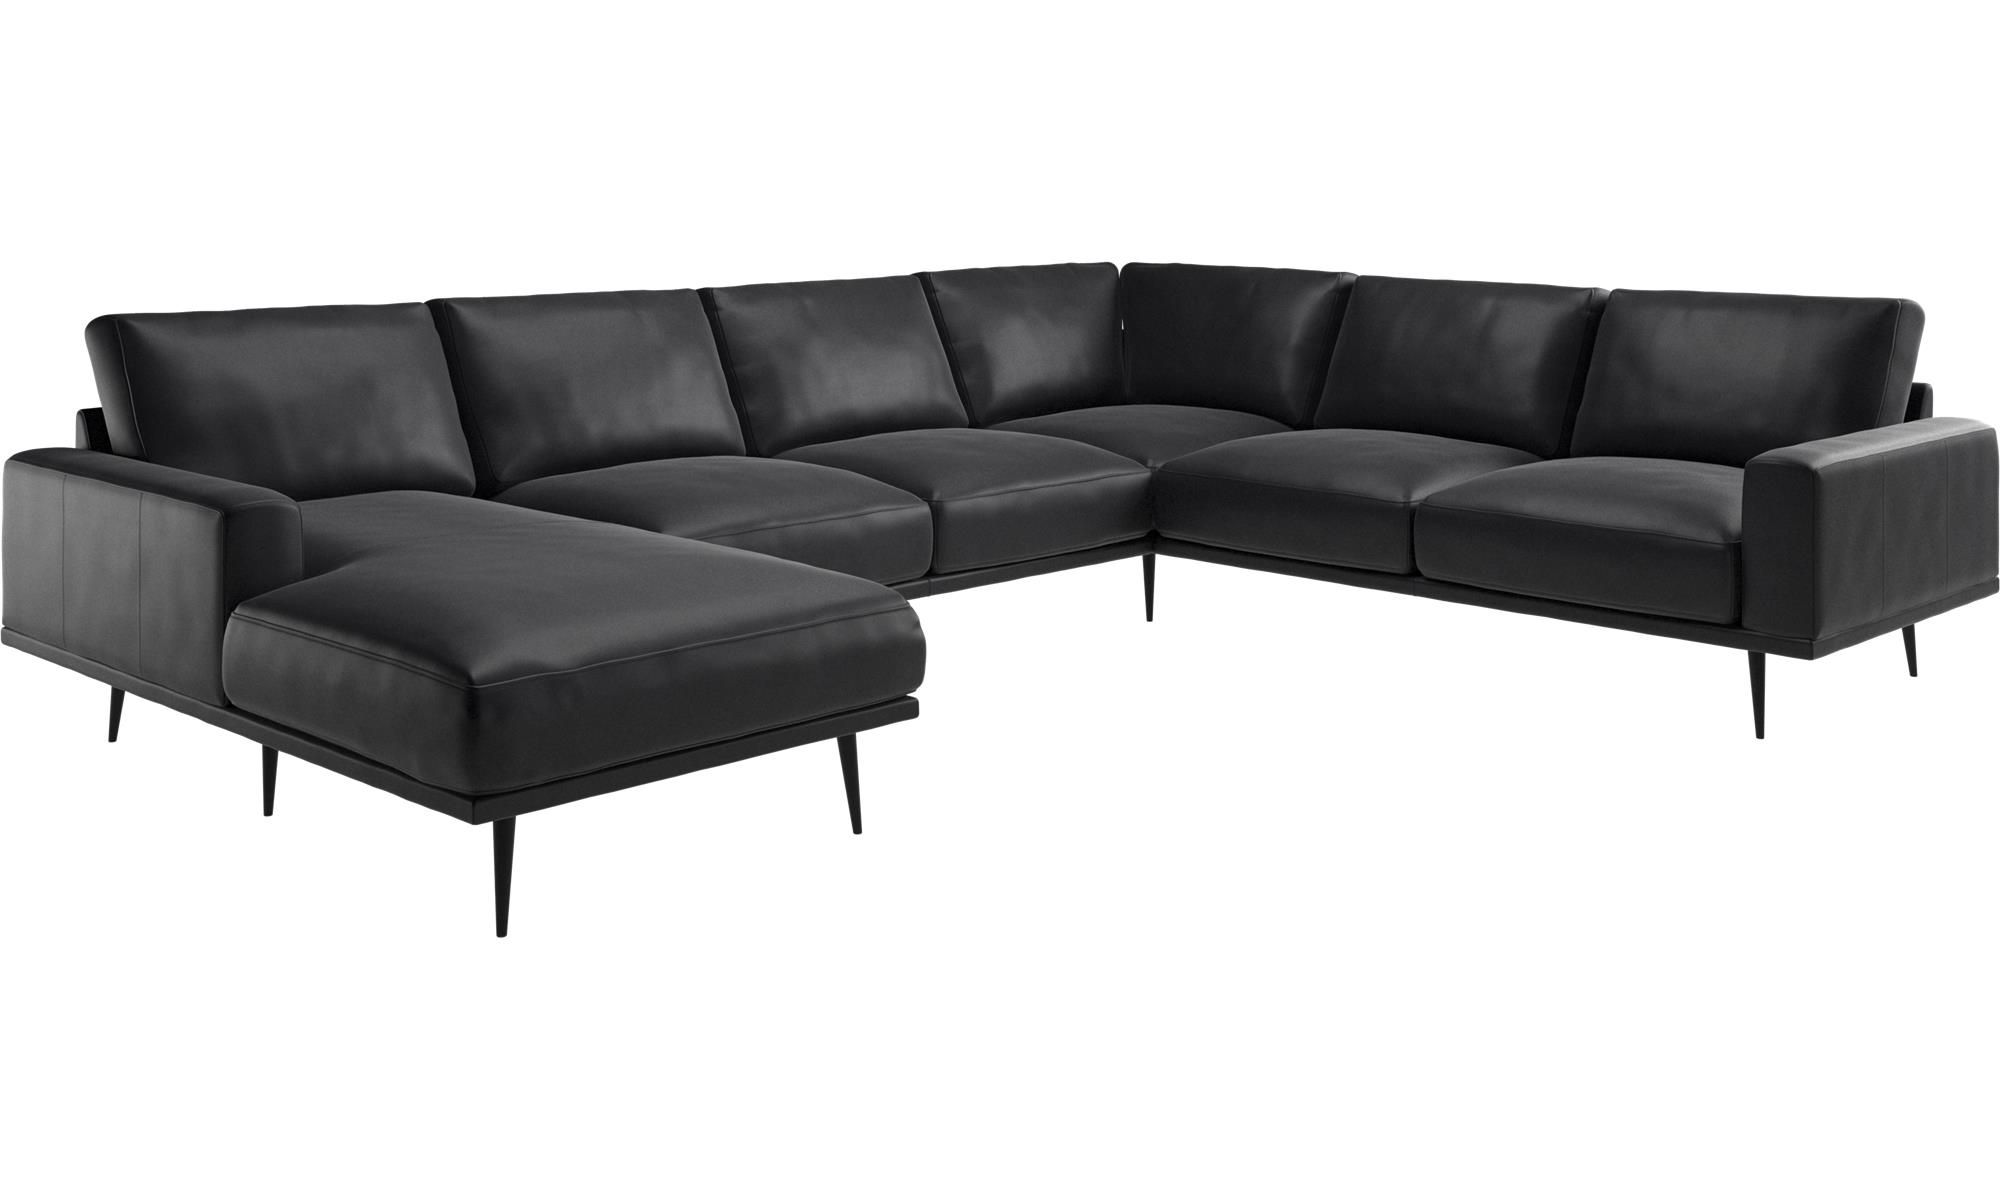 Best Rundsofa Leder Halb Rund Sofa Couch Uform Ledersofa Ledercouch  Designsofa Luaquila Try Pinterest Lofts With Rundcouch Leder